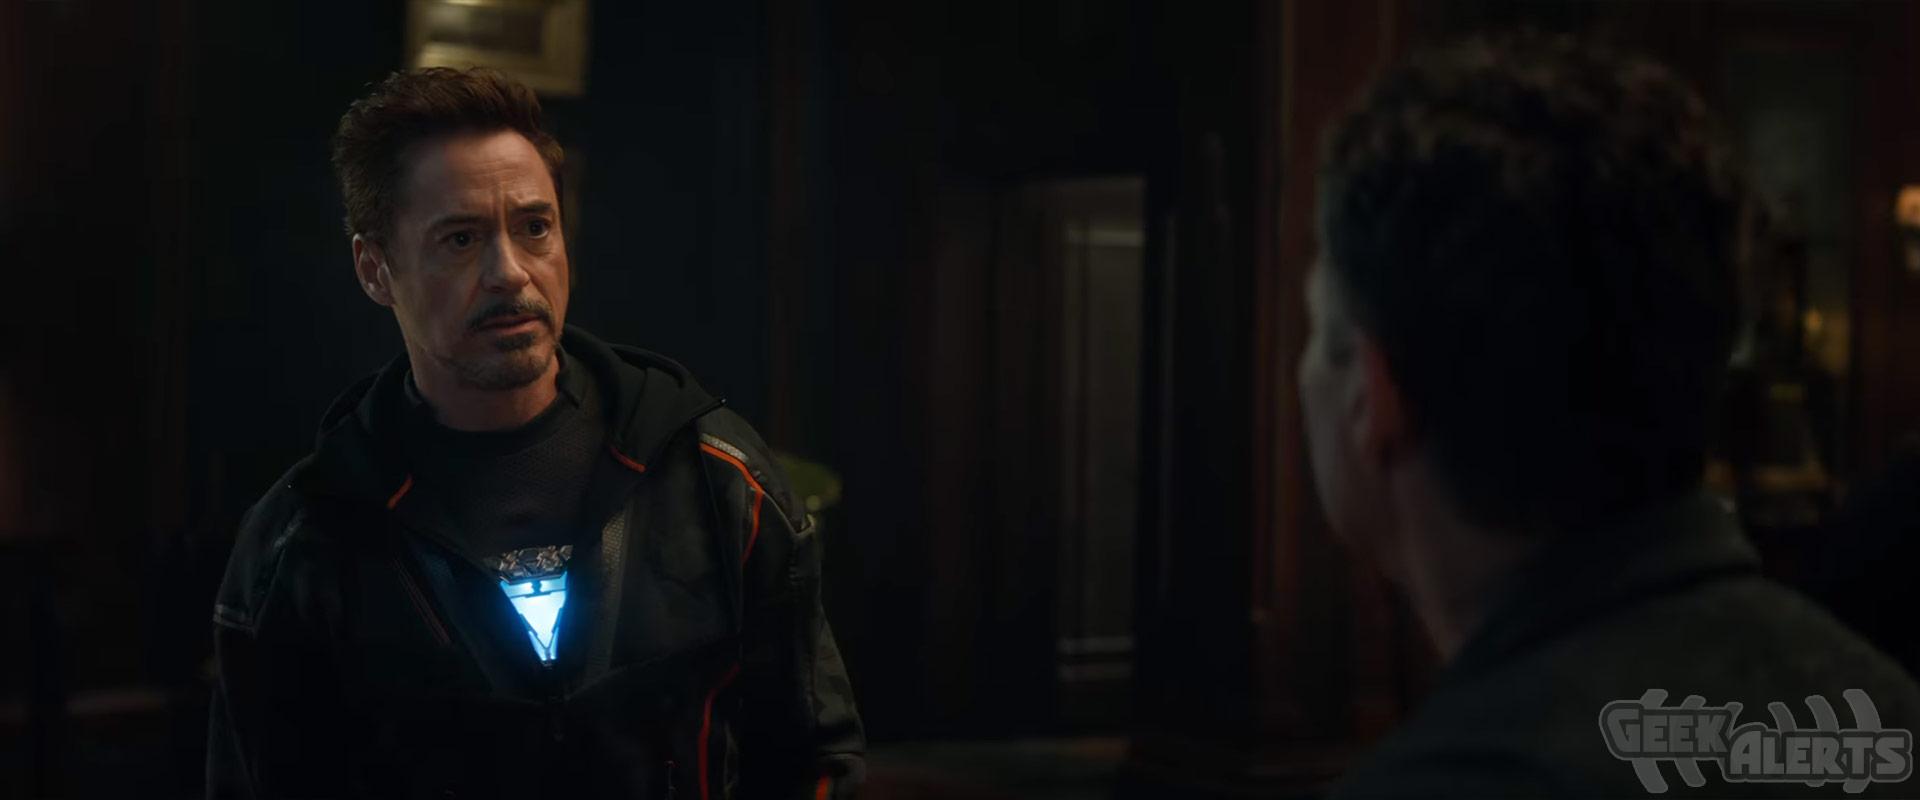 Avengers: Infinity War Super Bowl Trailer